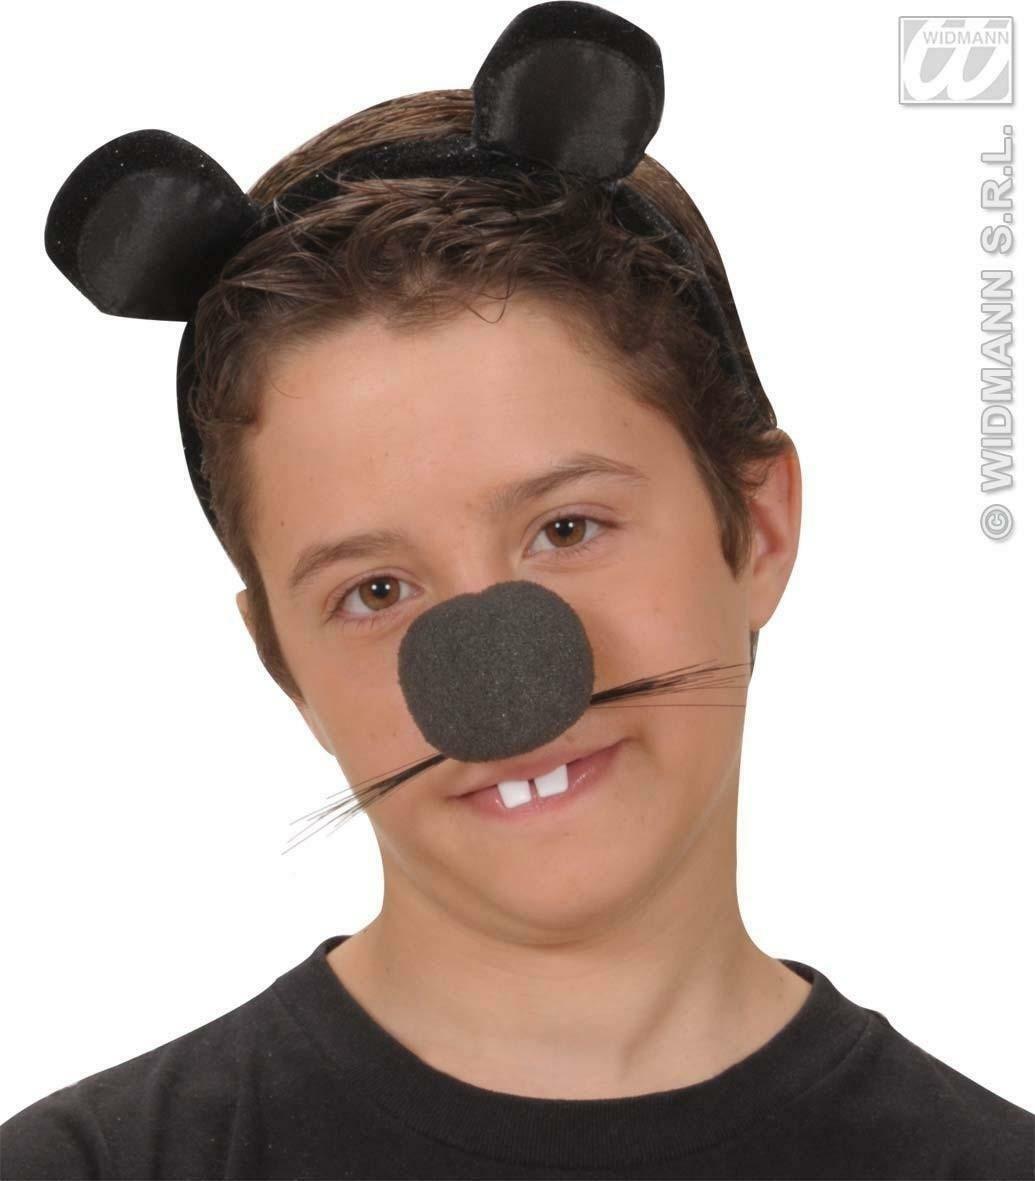 widmann widmann cerchietto con orecchie topo